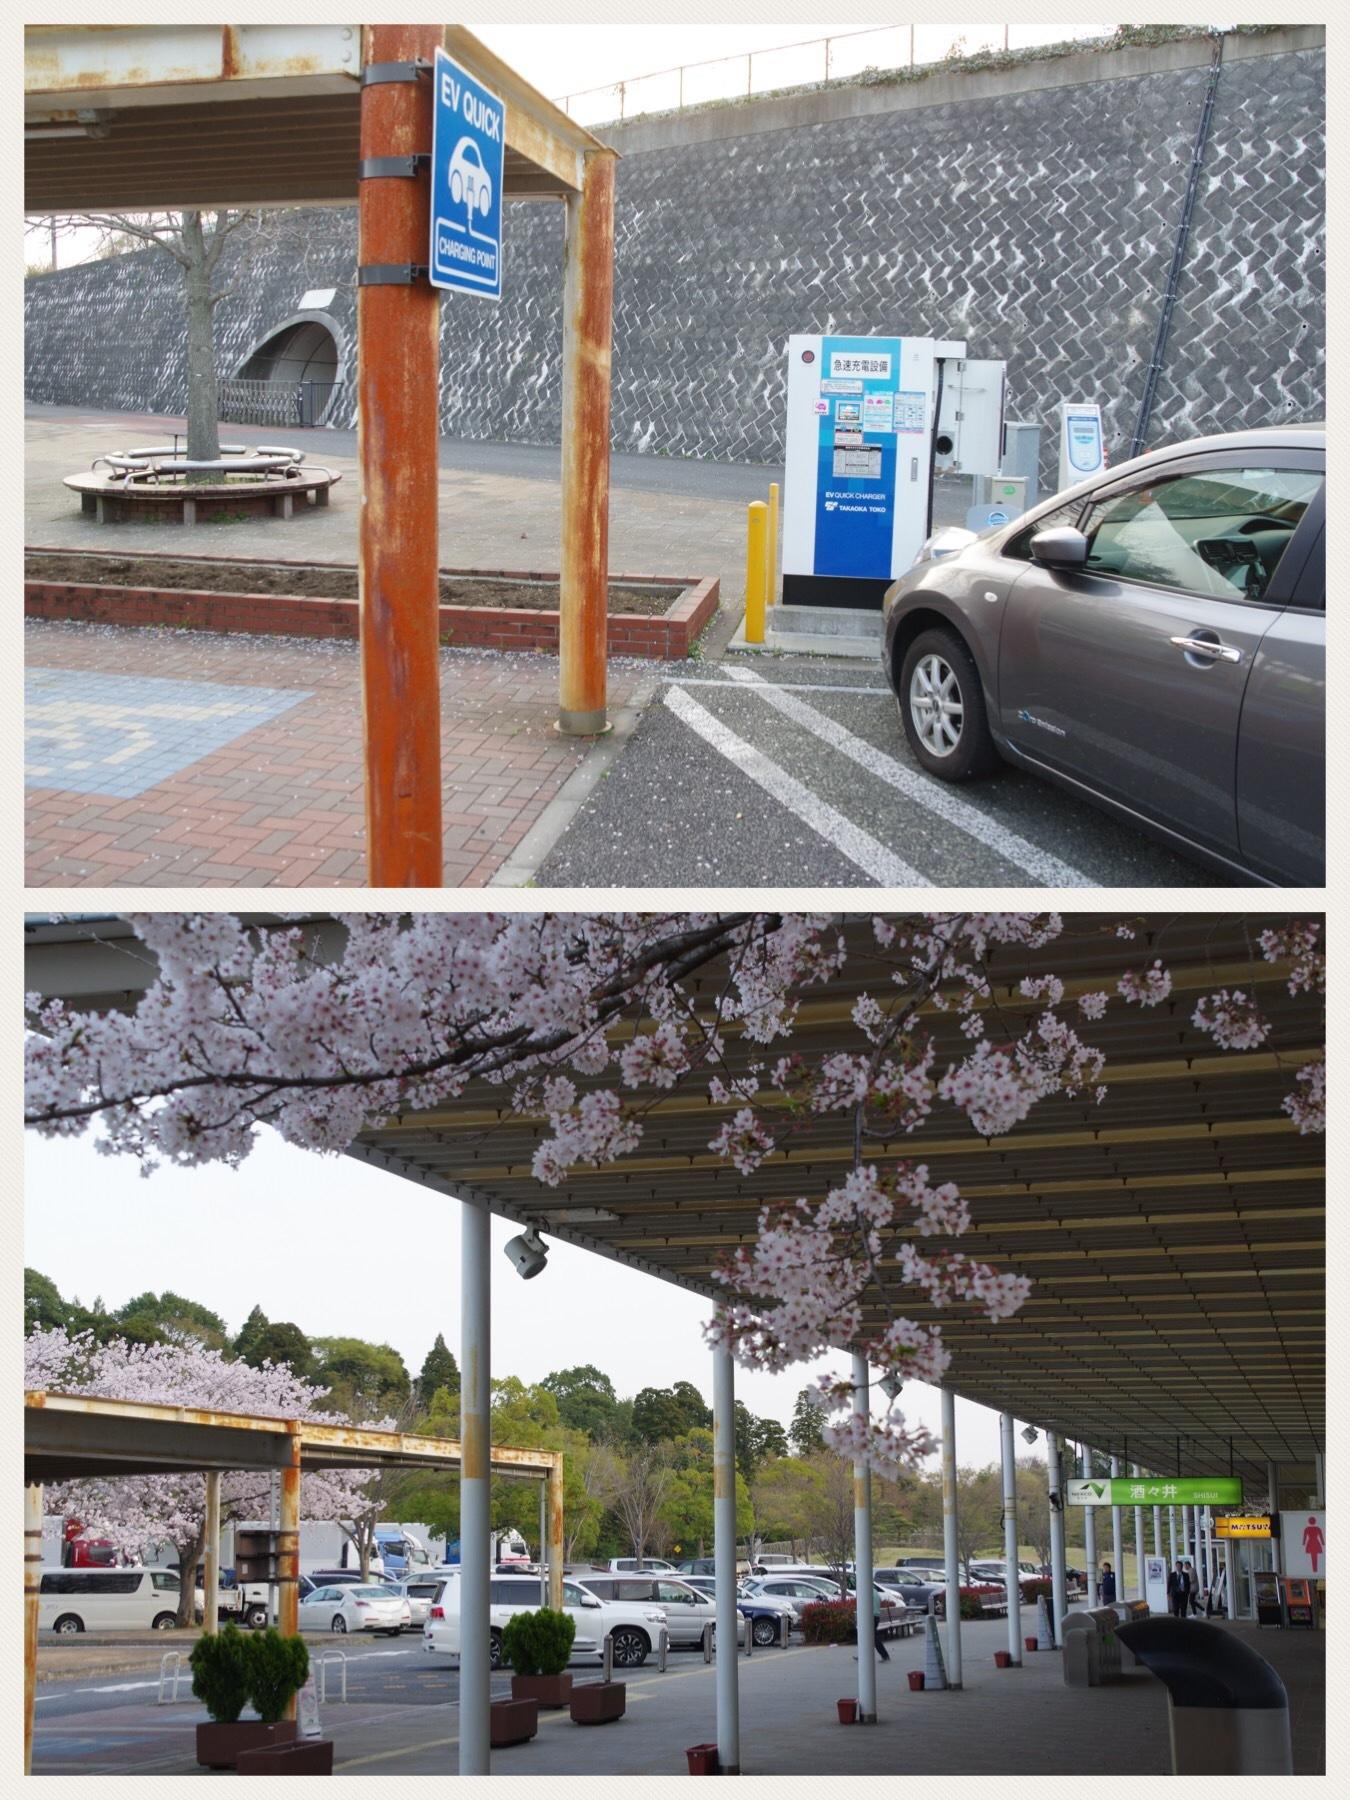 EV.PHEV充電スポット情報 東関東自動車道 酒々井(しすい)PA